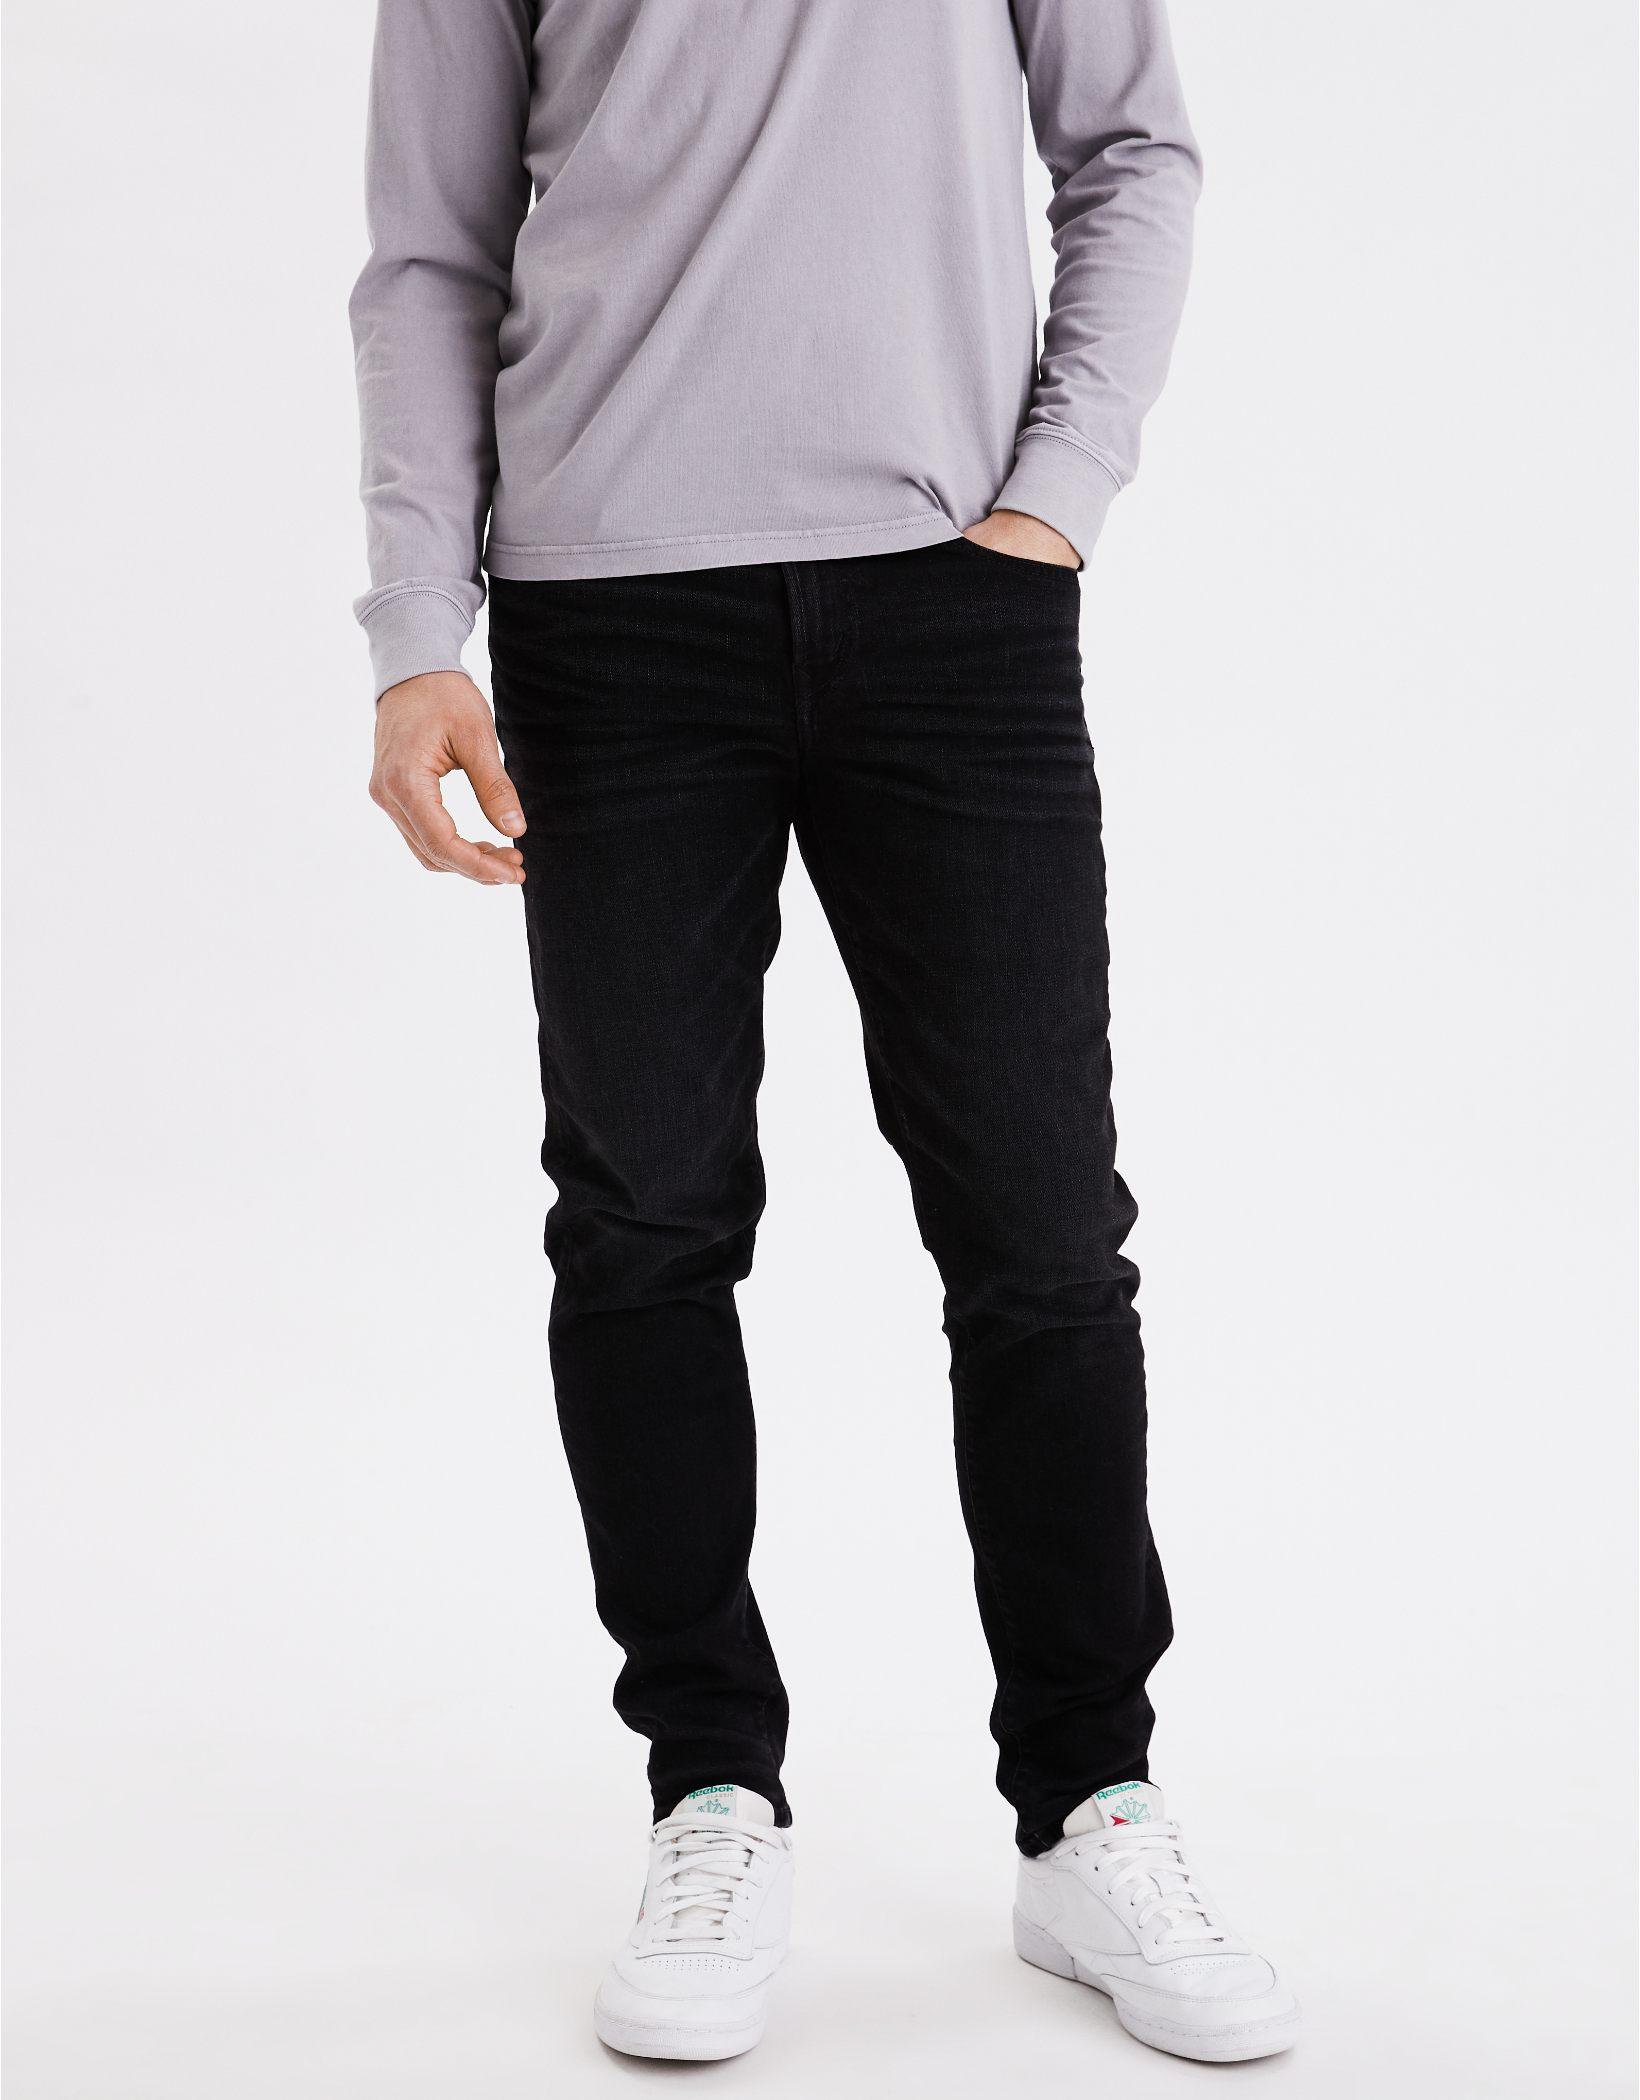 AE AirFlex+ Athletic Fit Jean